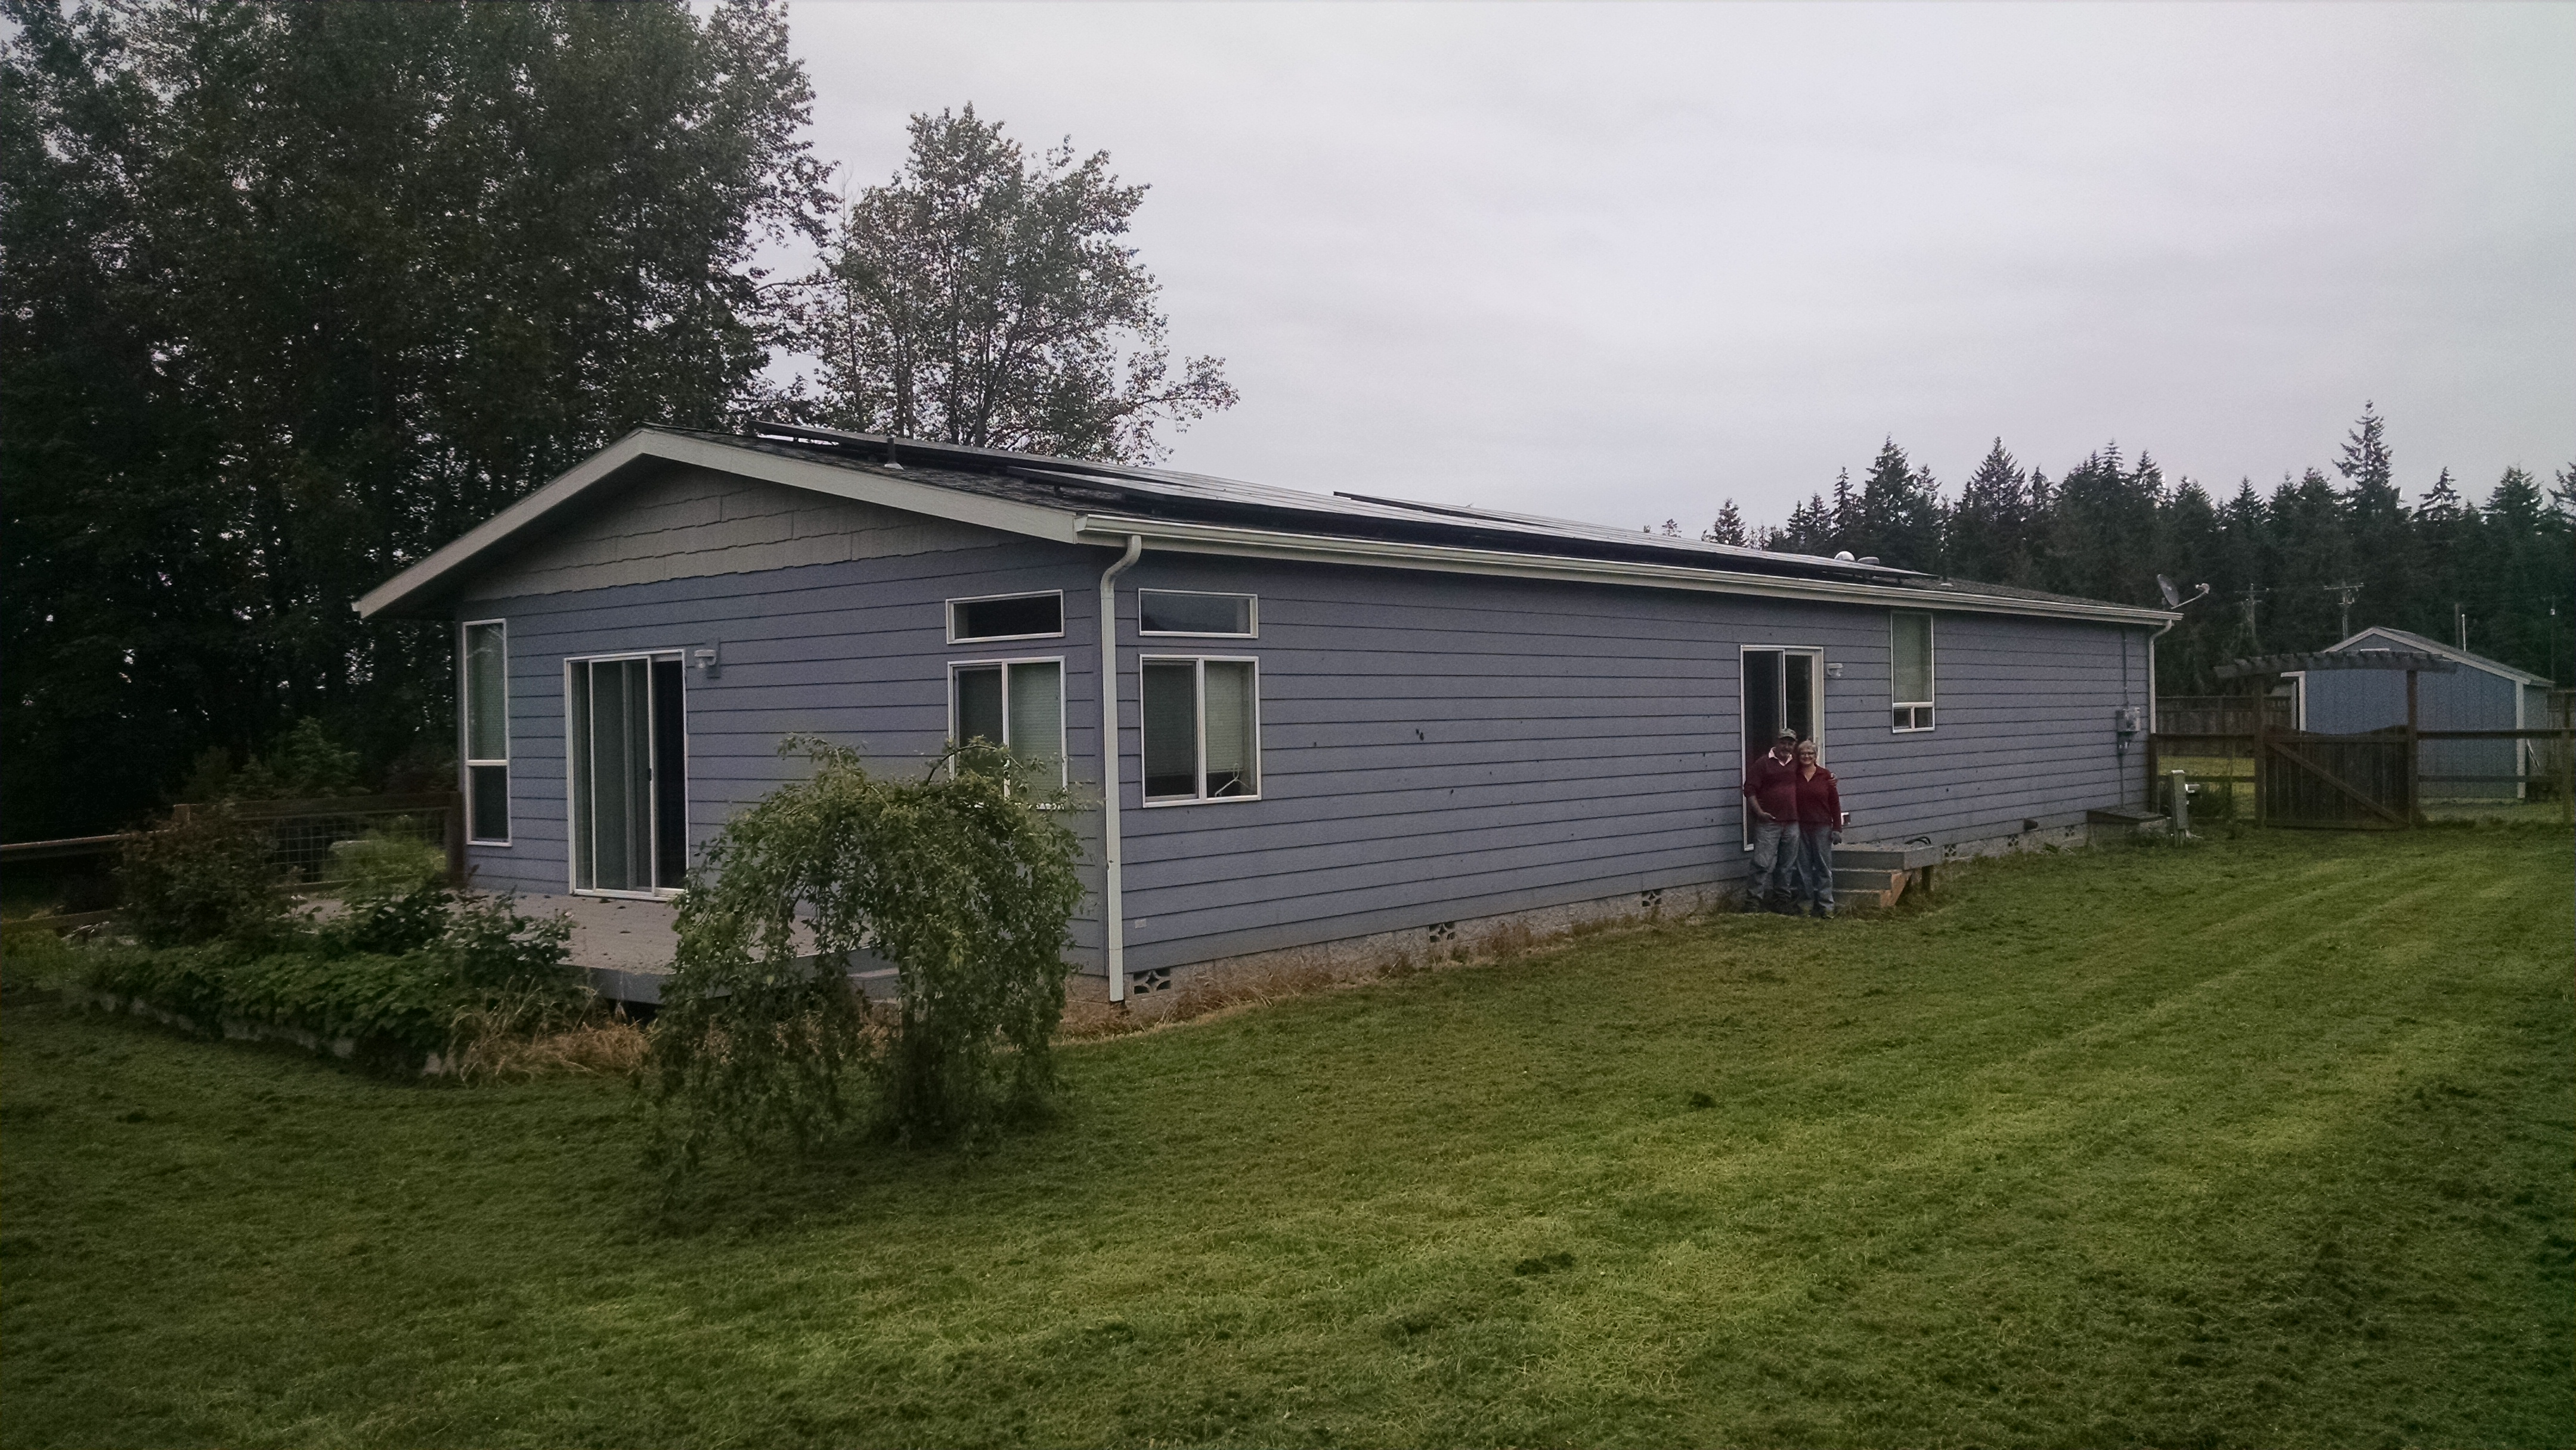 Residence, 9.66 KW, Sequim, 2017